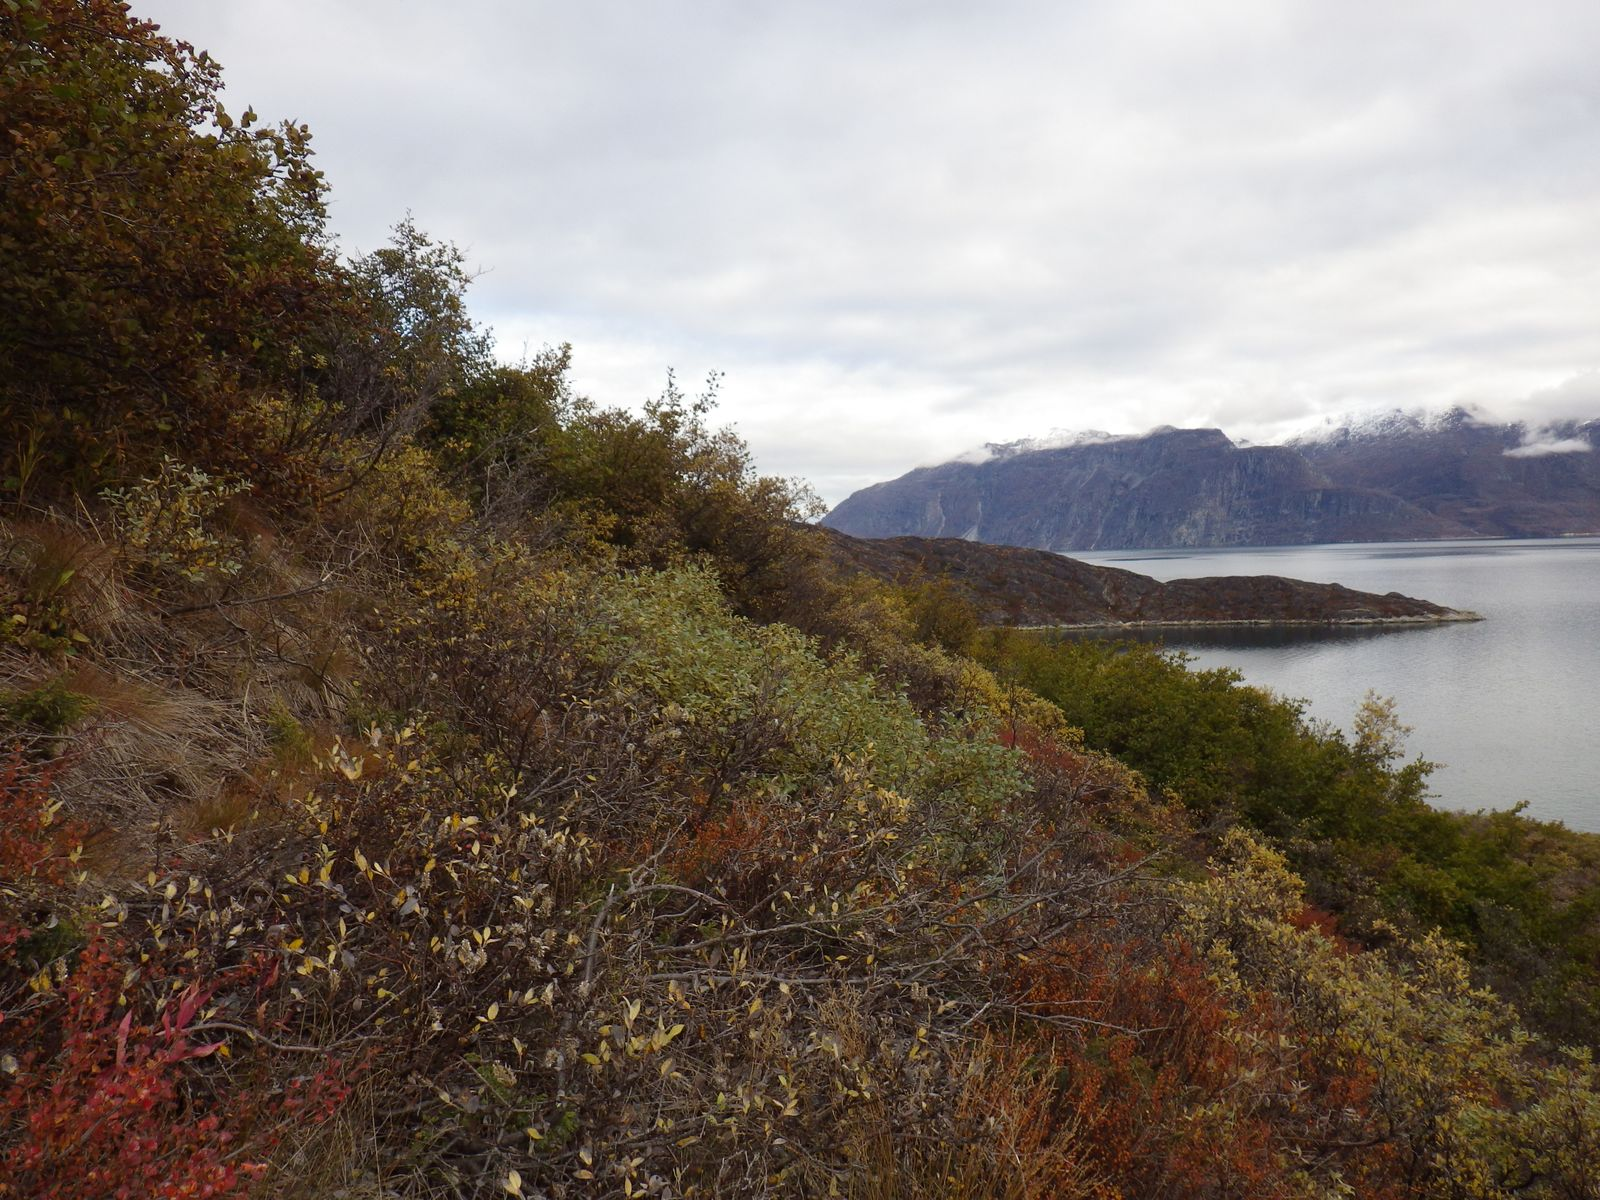 2013-09-28-1742_-_gode_1_vegetation